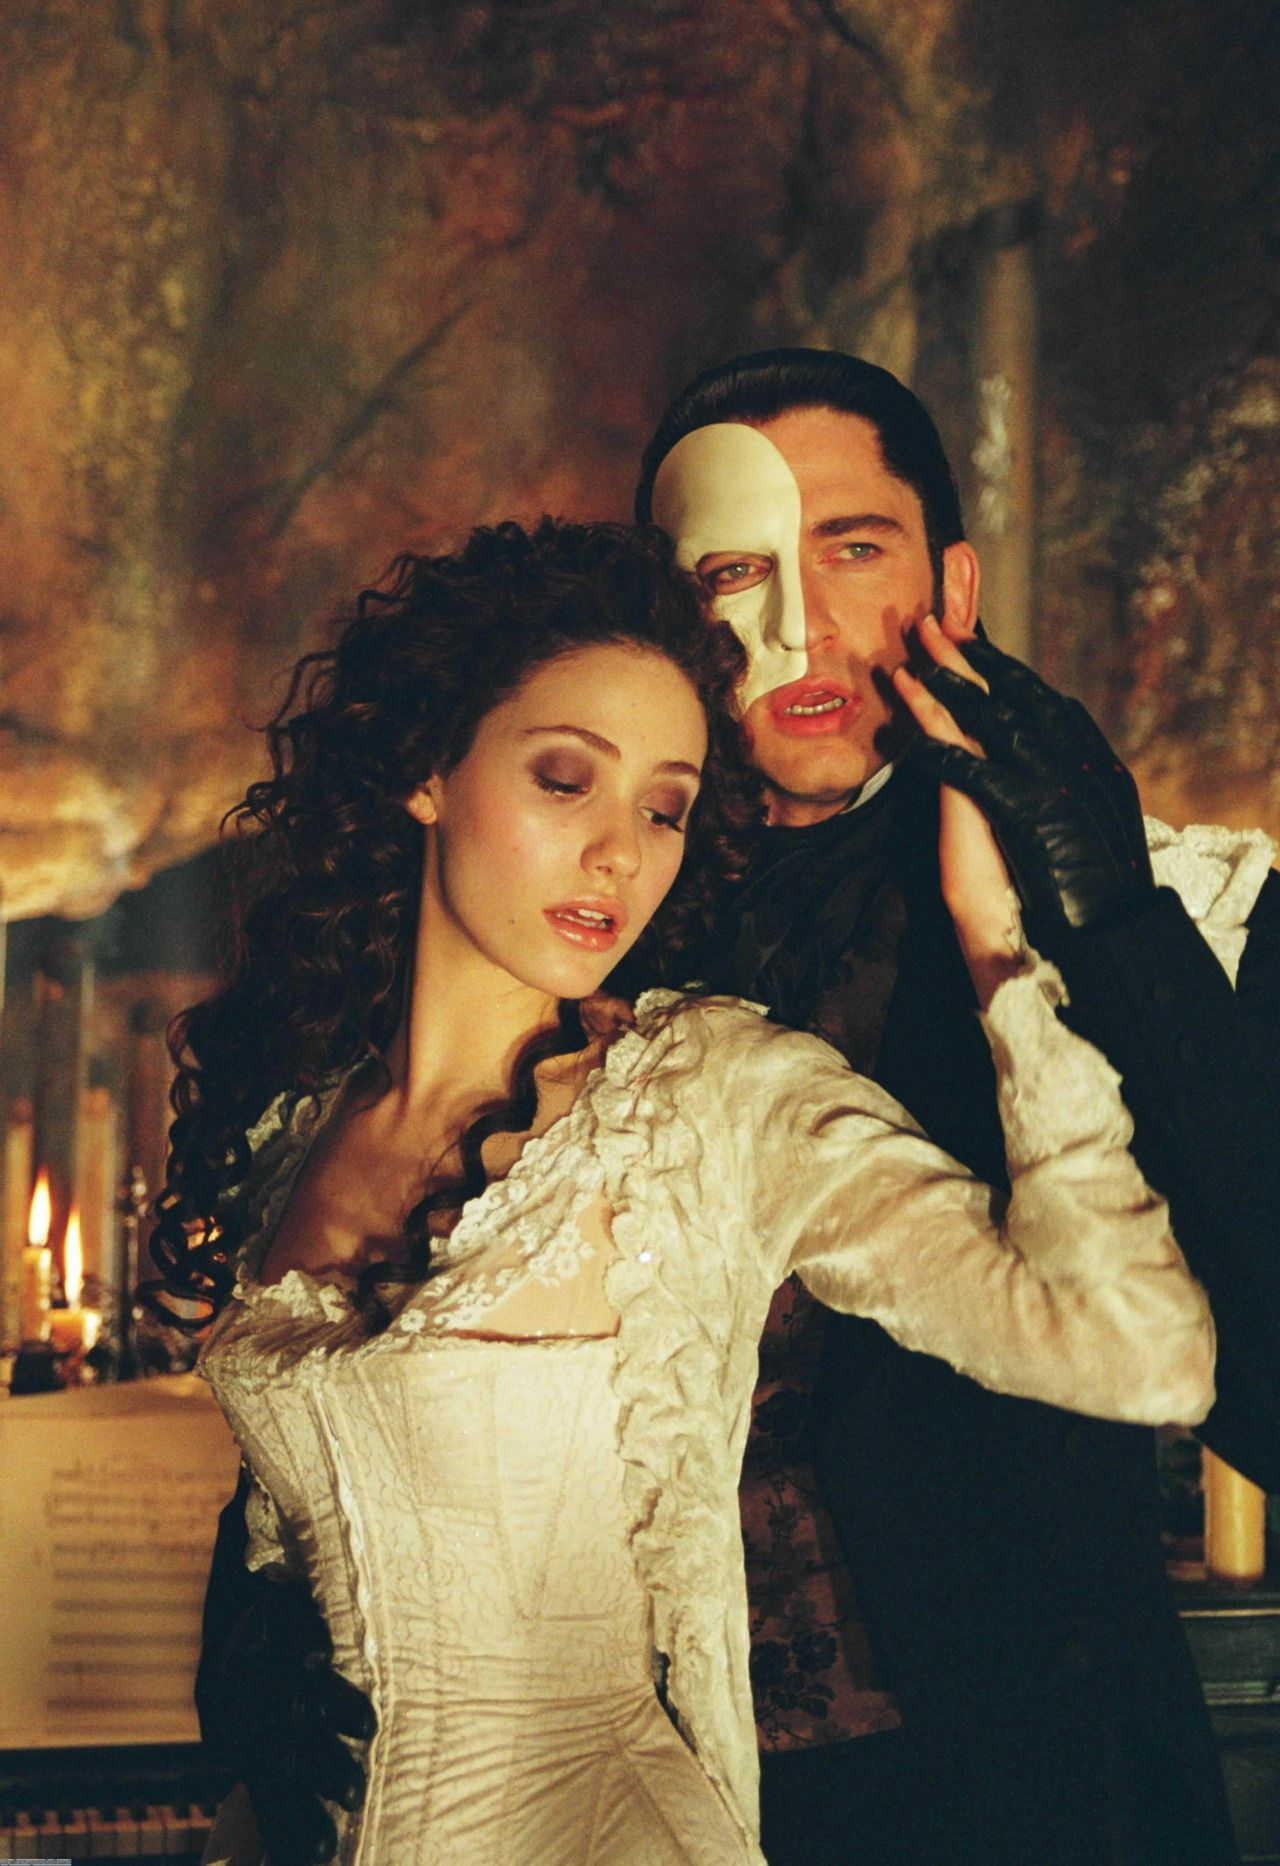 Christine and Raoul - ALWs Phantom of the Opera movie